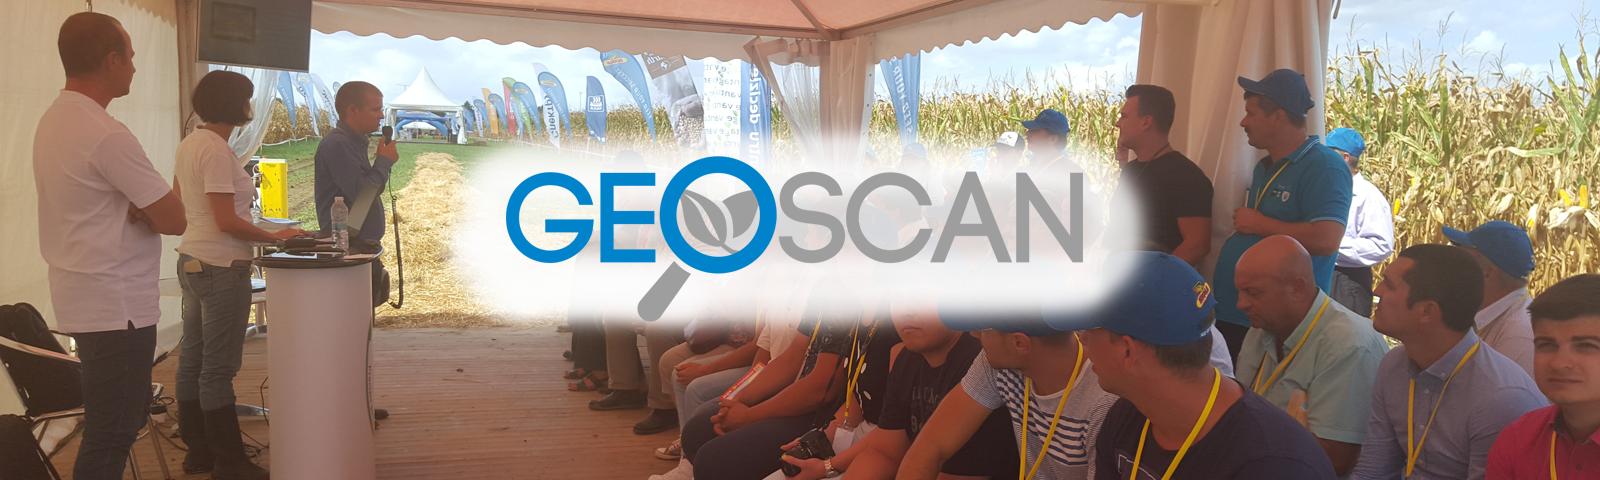 GeoSCAN – Monsanto Summer Tour in Romania